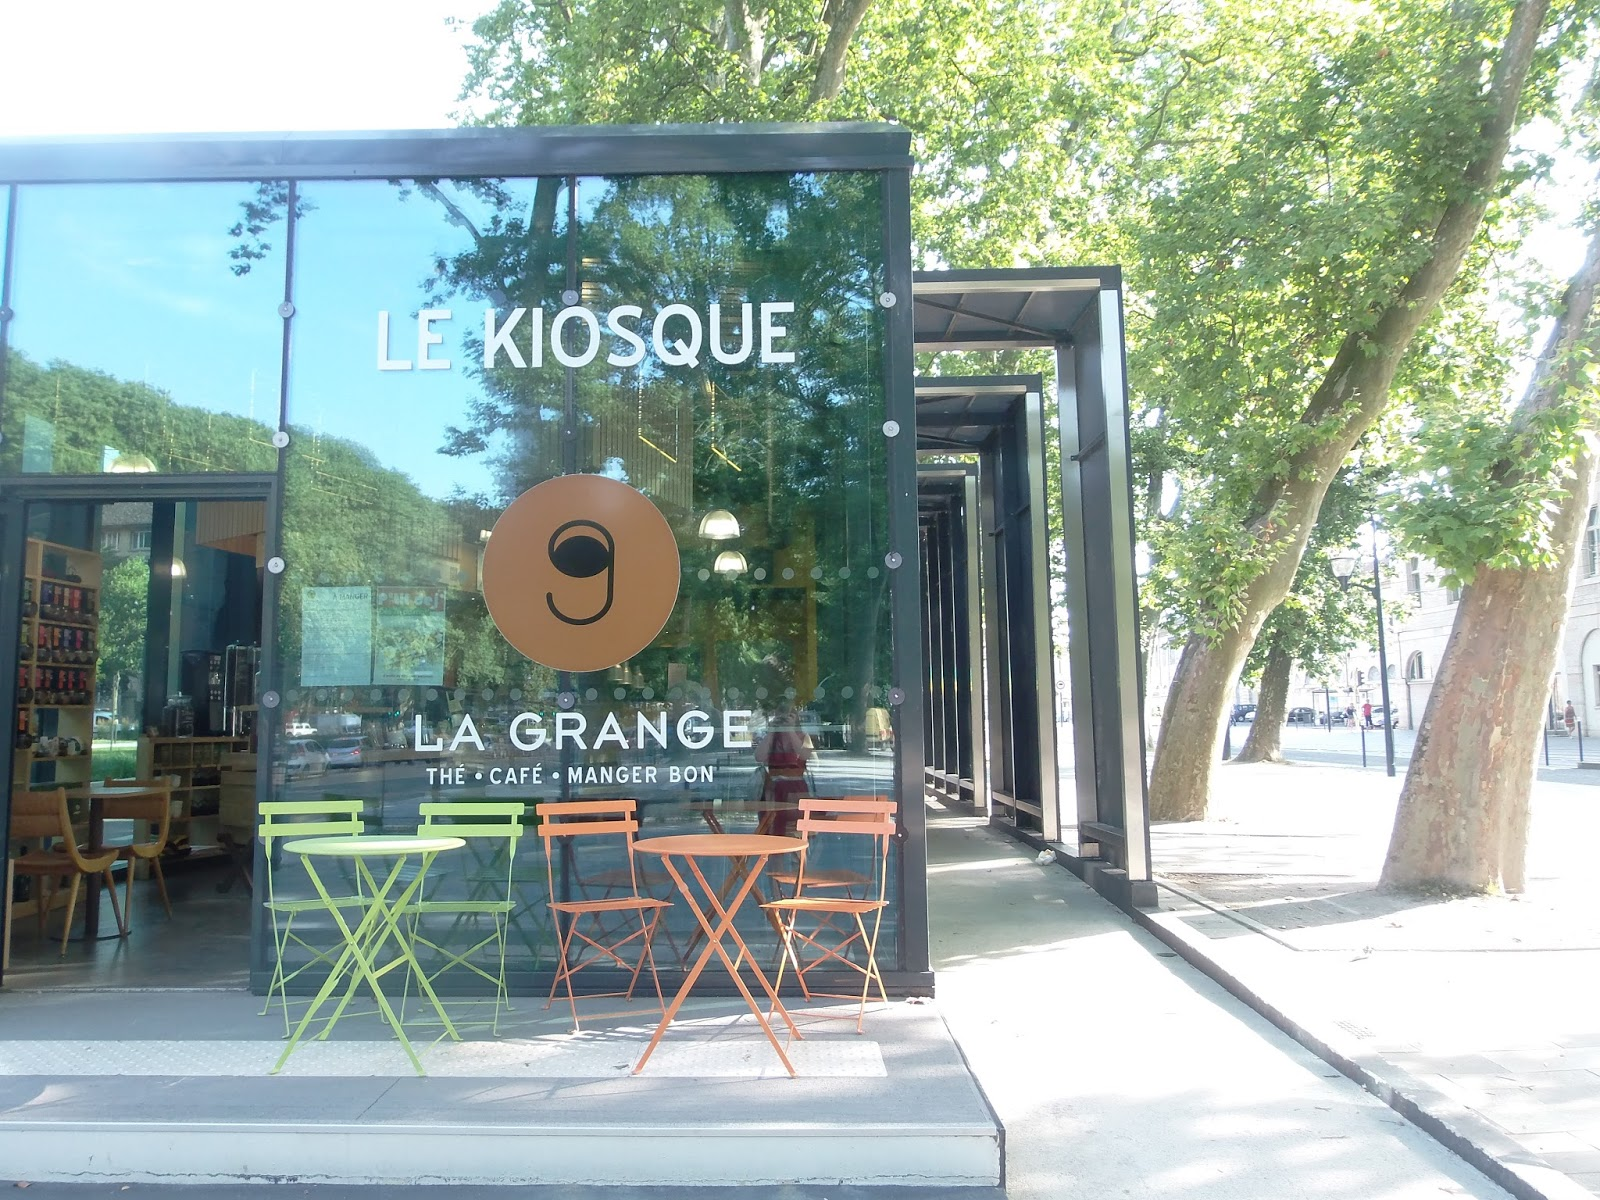 Juliette et marie juillet 2015 - Restaurant la grange besancon ...